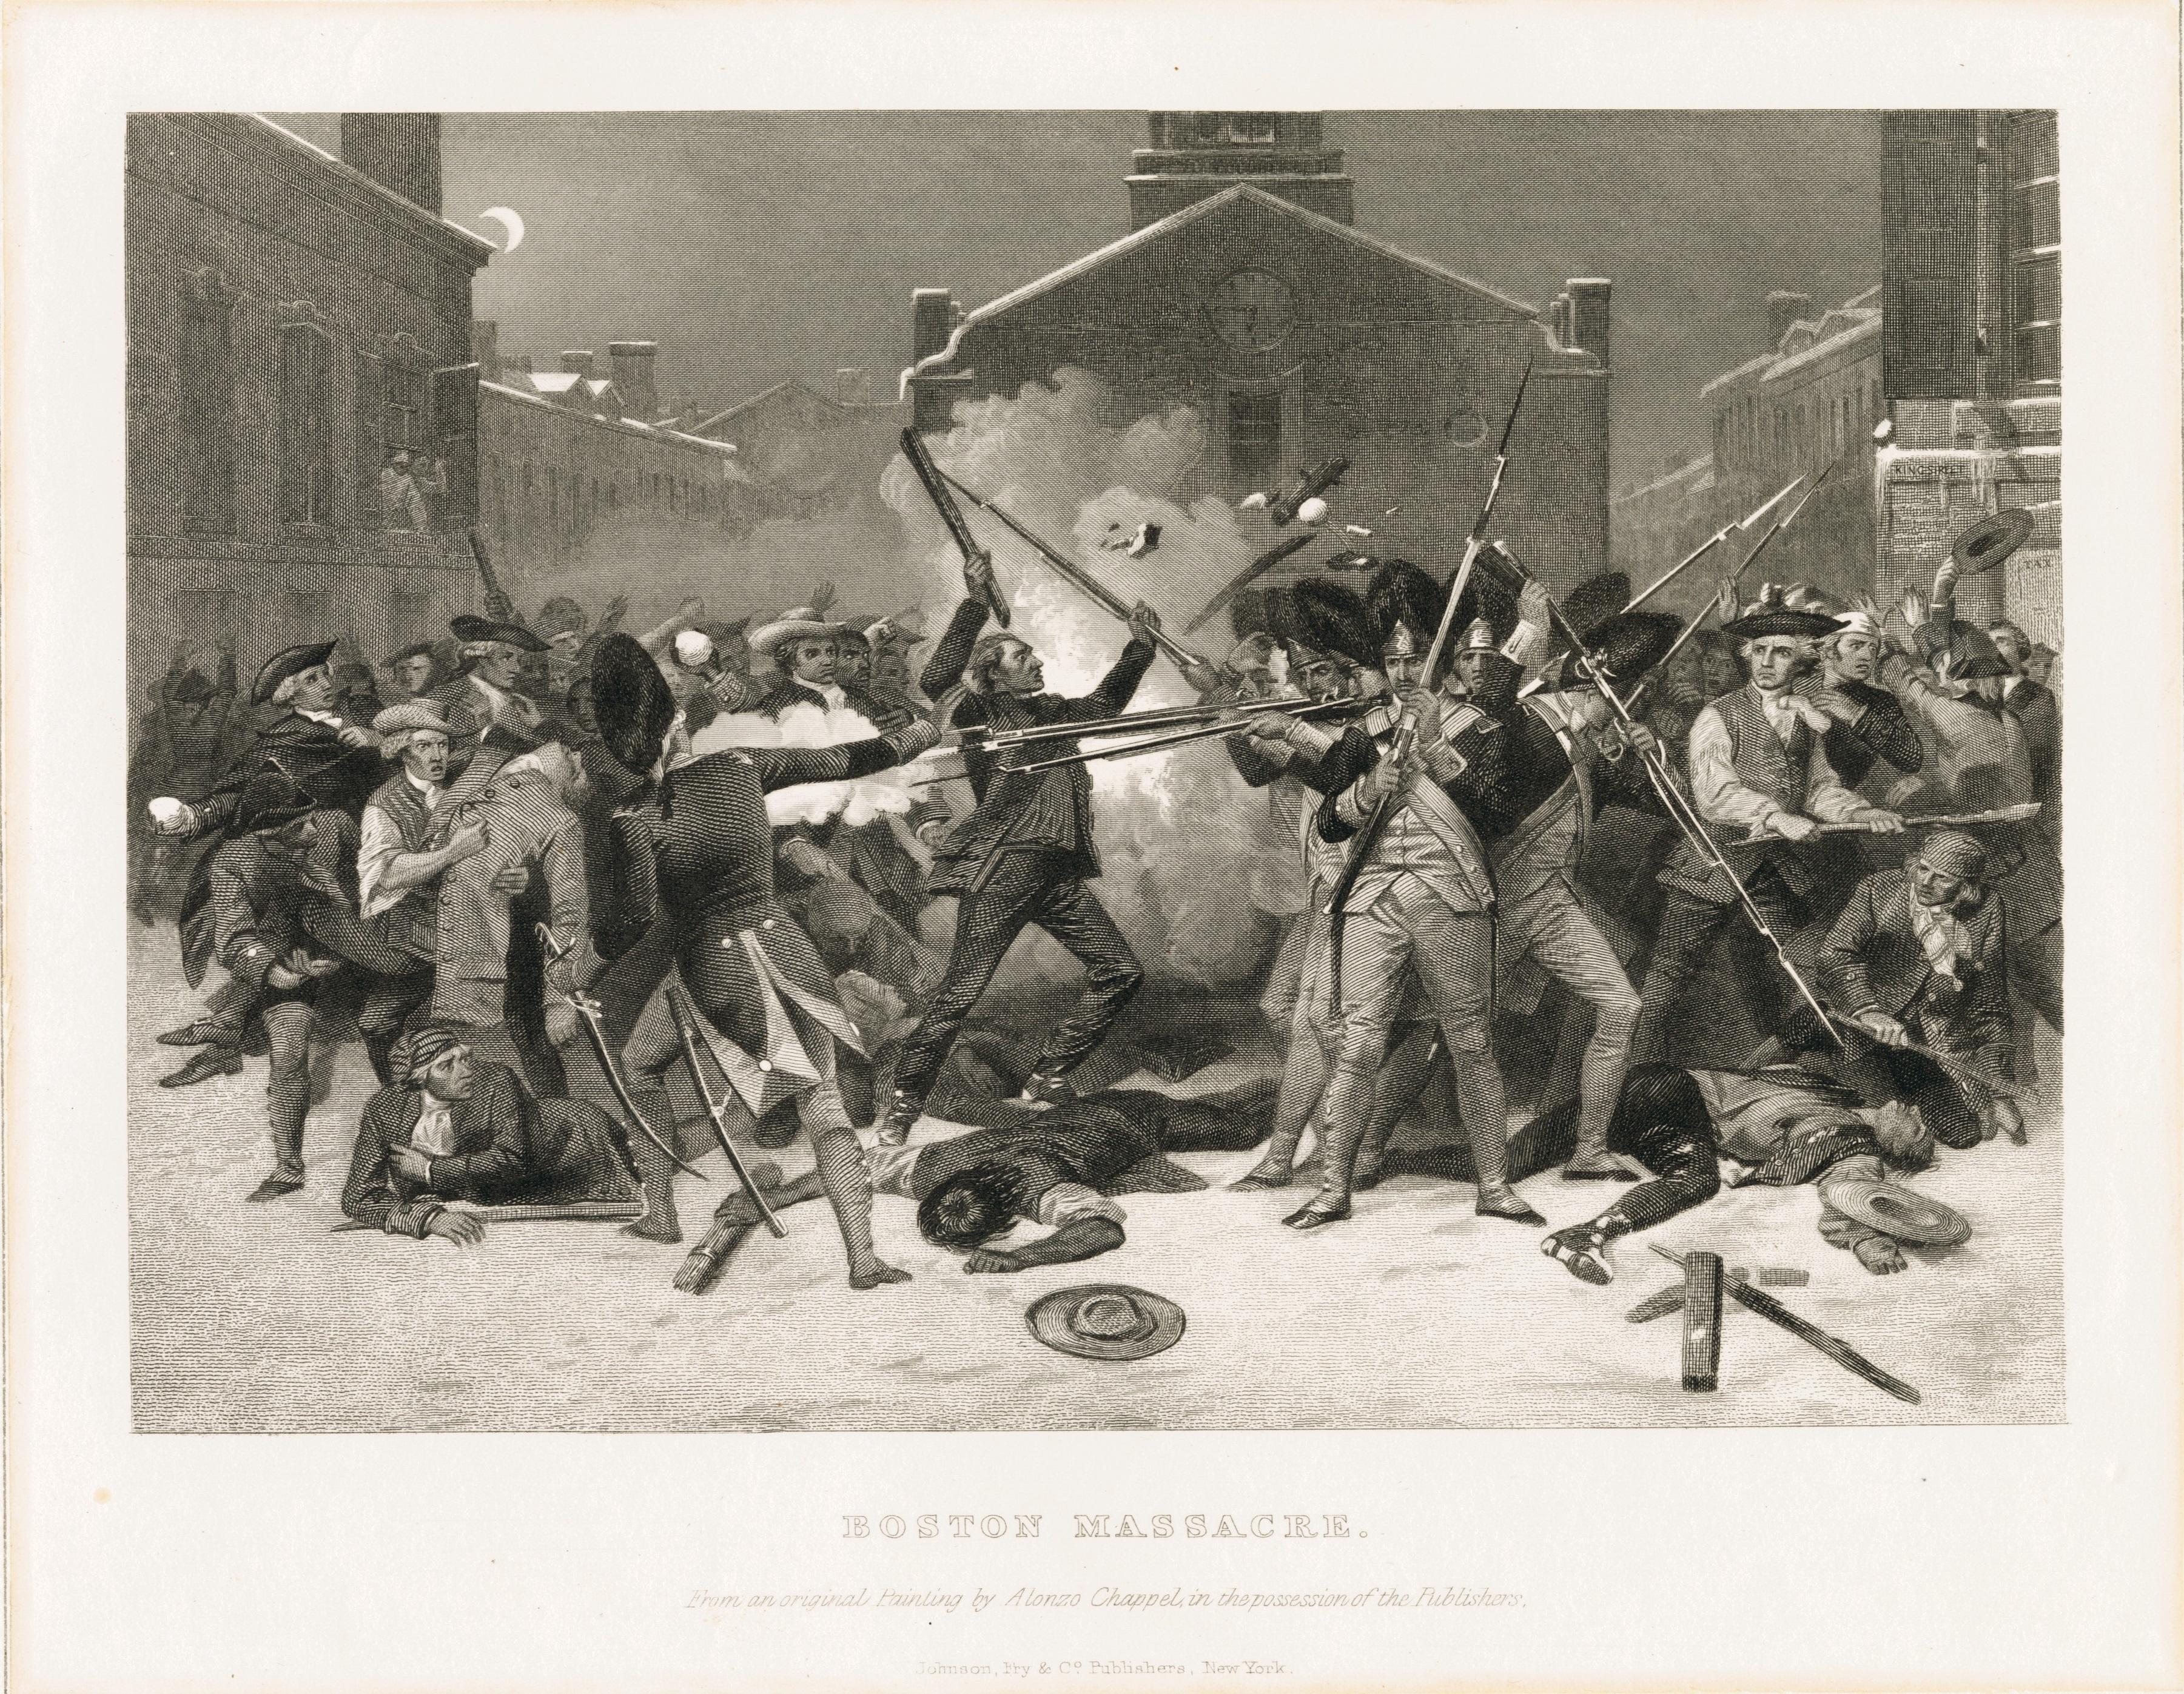 http://upload.wikimedia.org/wikipedia/commons/d/d7/BostonMassacre_byAlonzoChappel1878.png